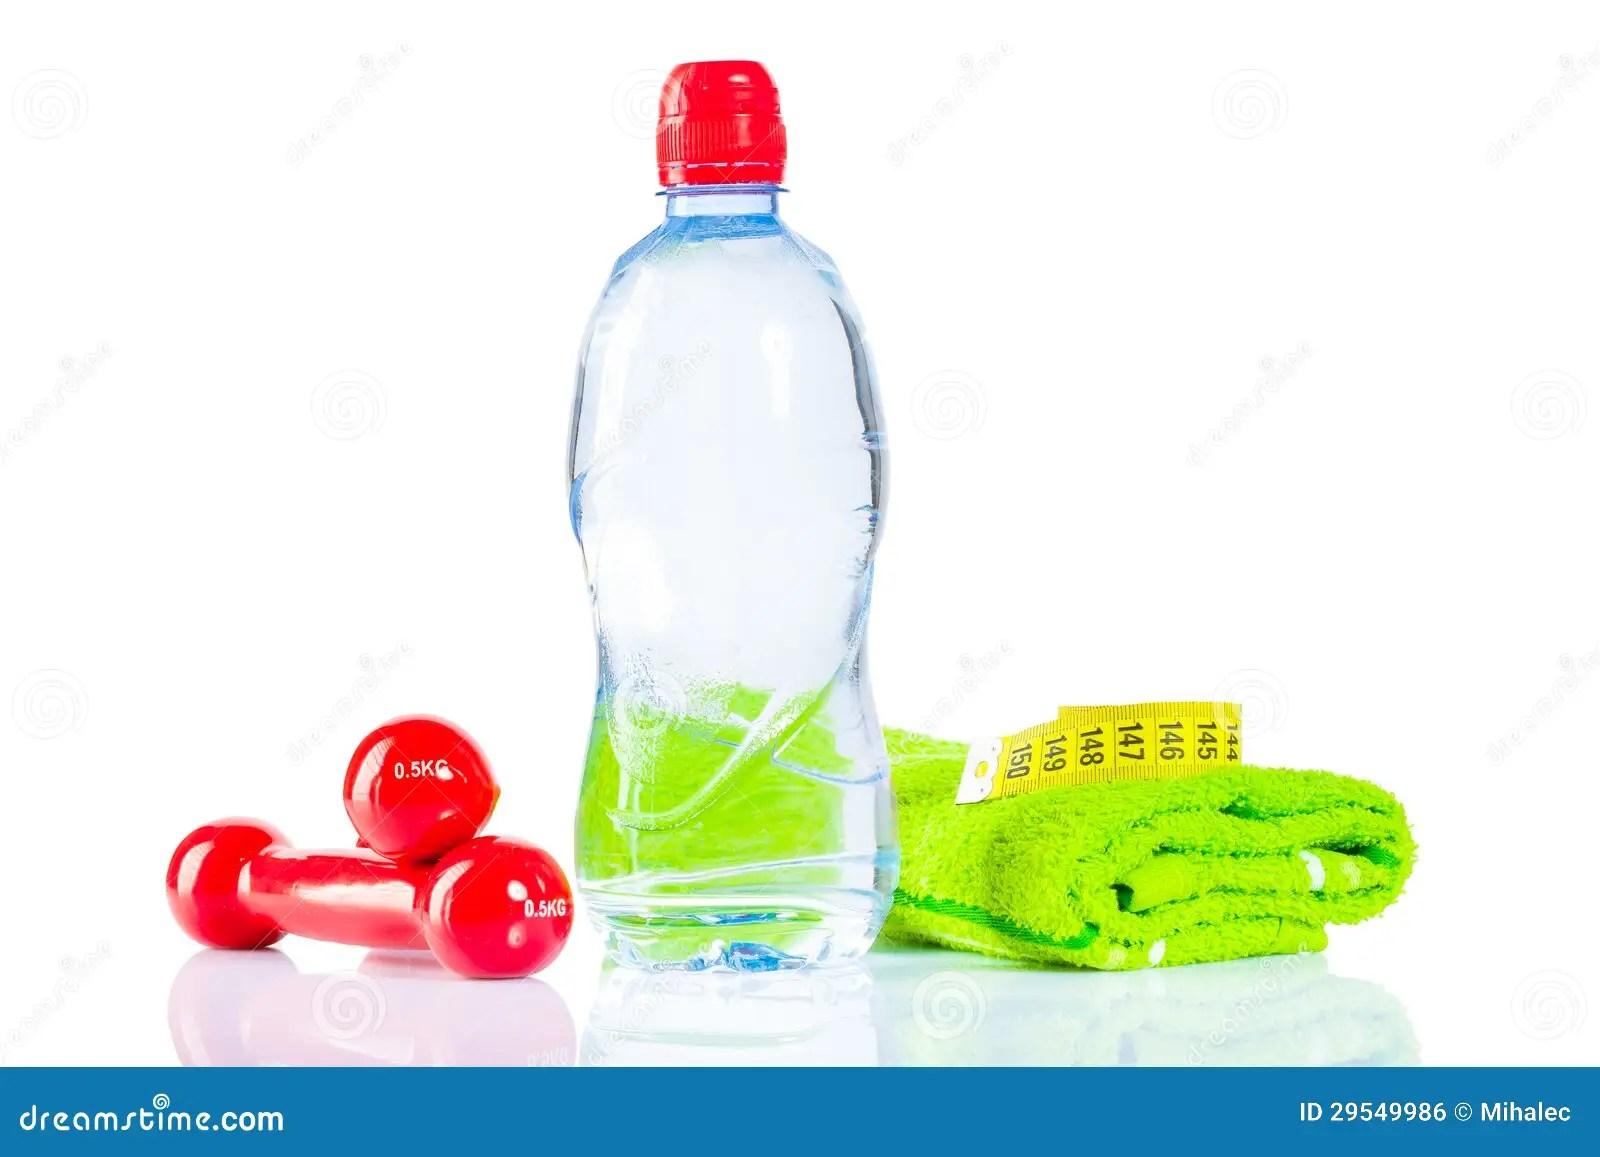 Bottles Dumbbells Towel Tape Royalty Free Stock Image